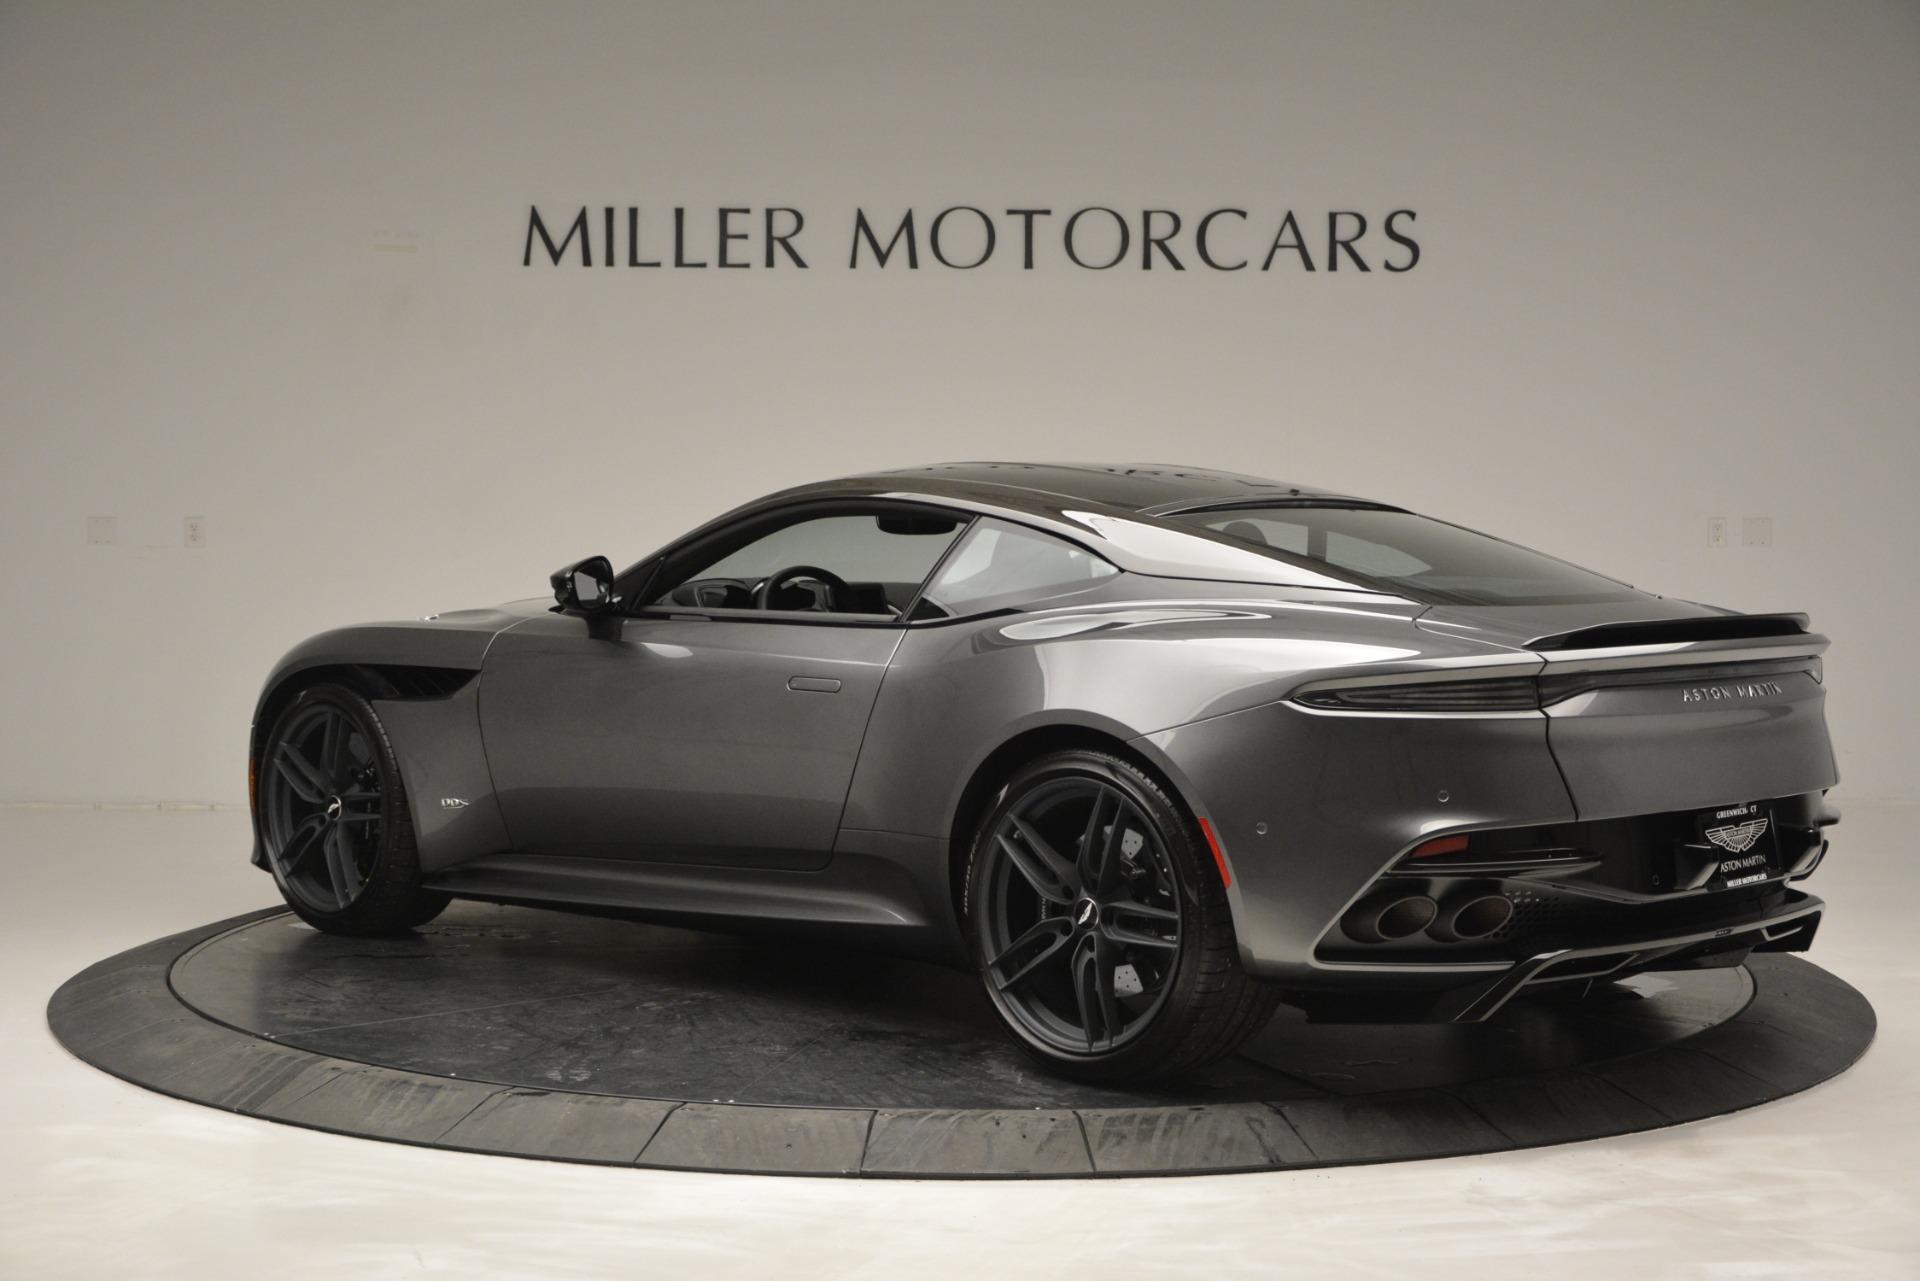 Used 2019 Aston Martin DBS Superleggera For Sale In Greenwich, CT 2917_p4